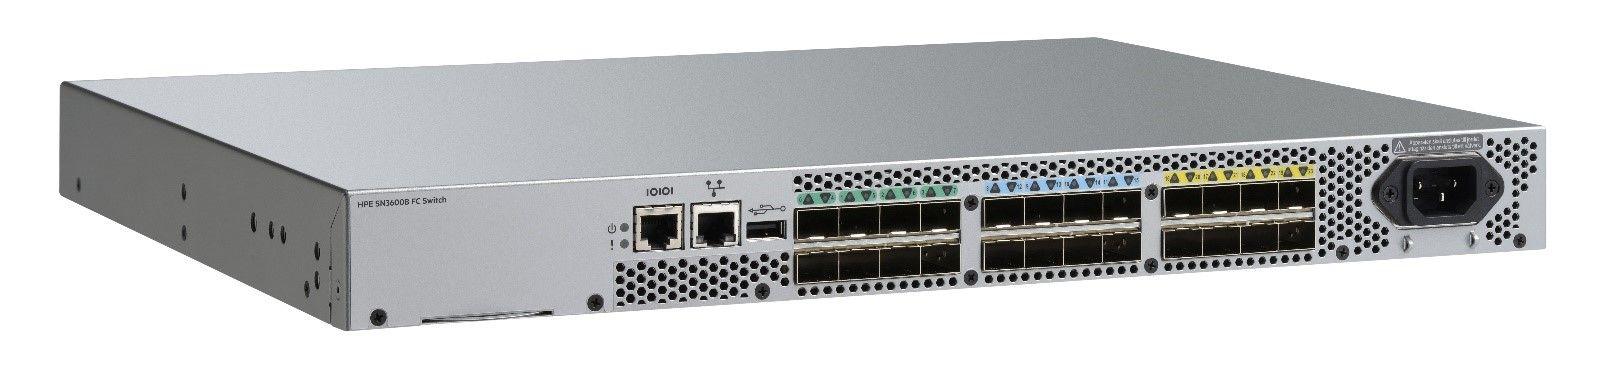 The HPE B-series SN3600B